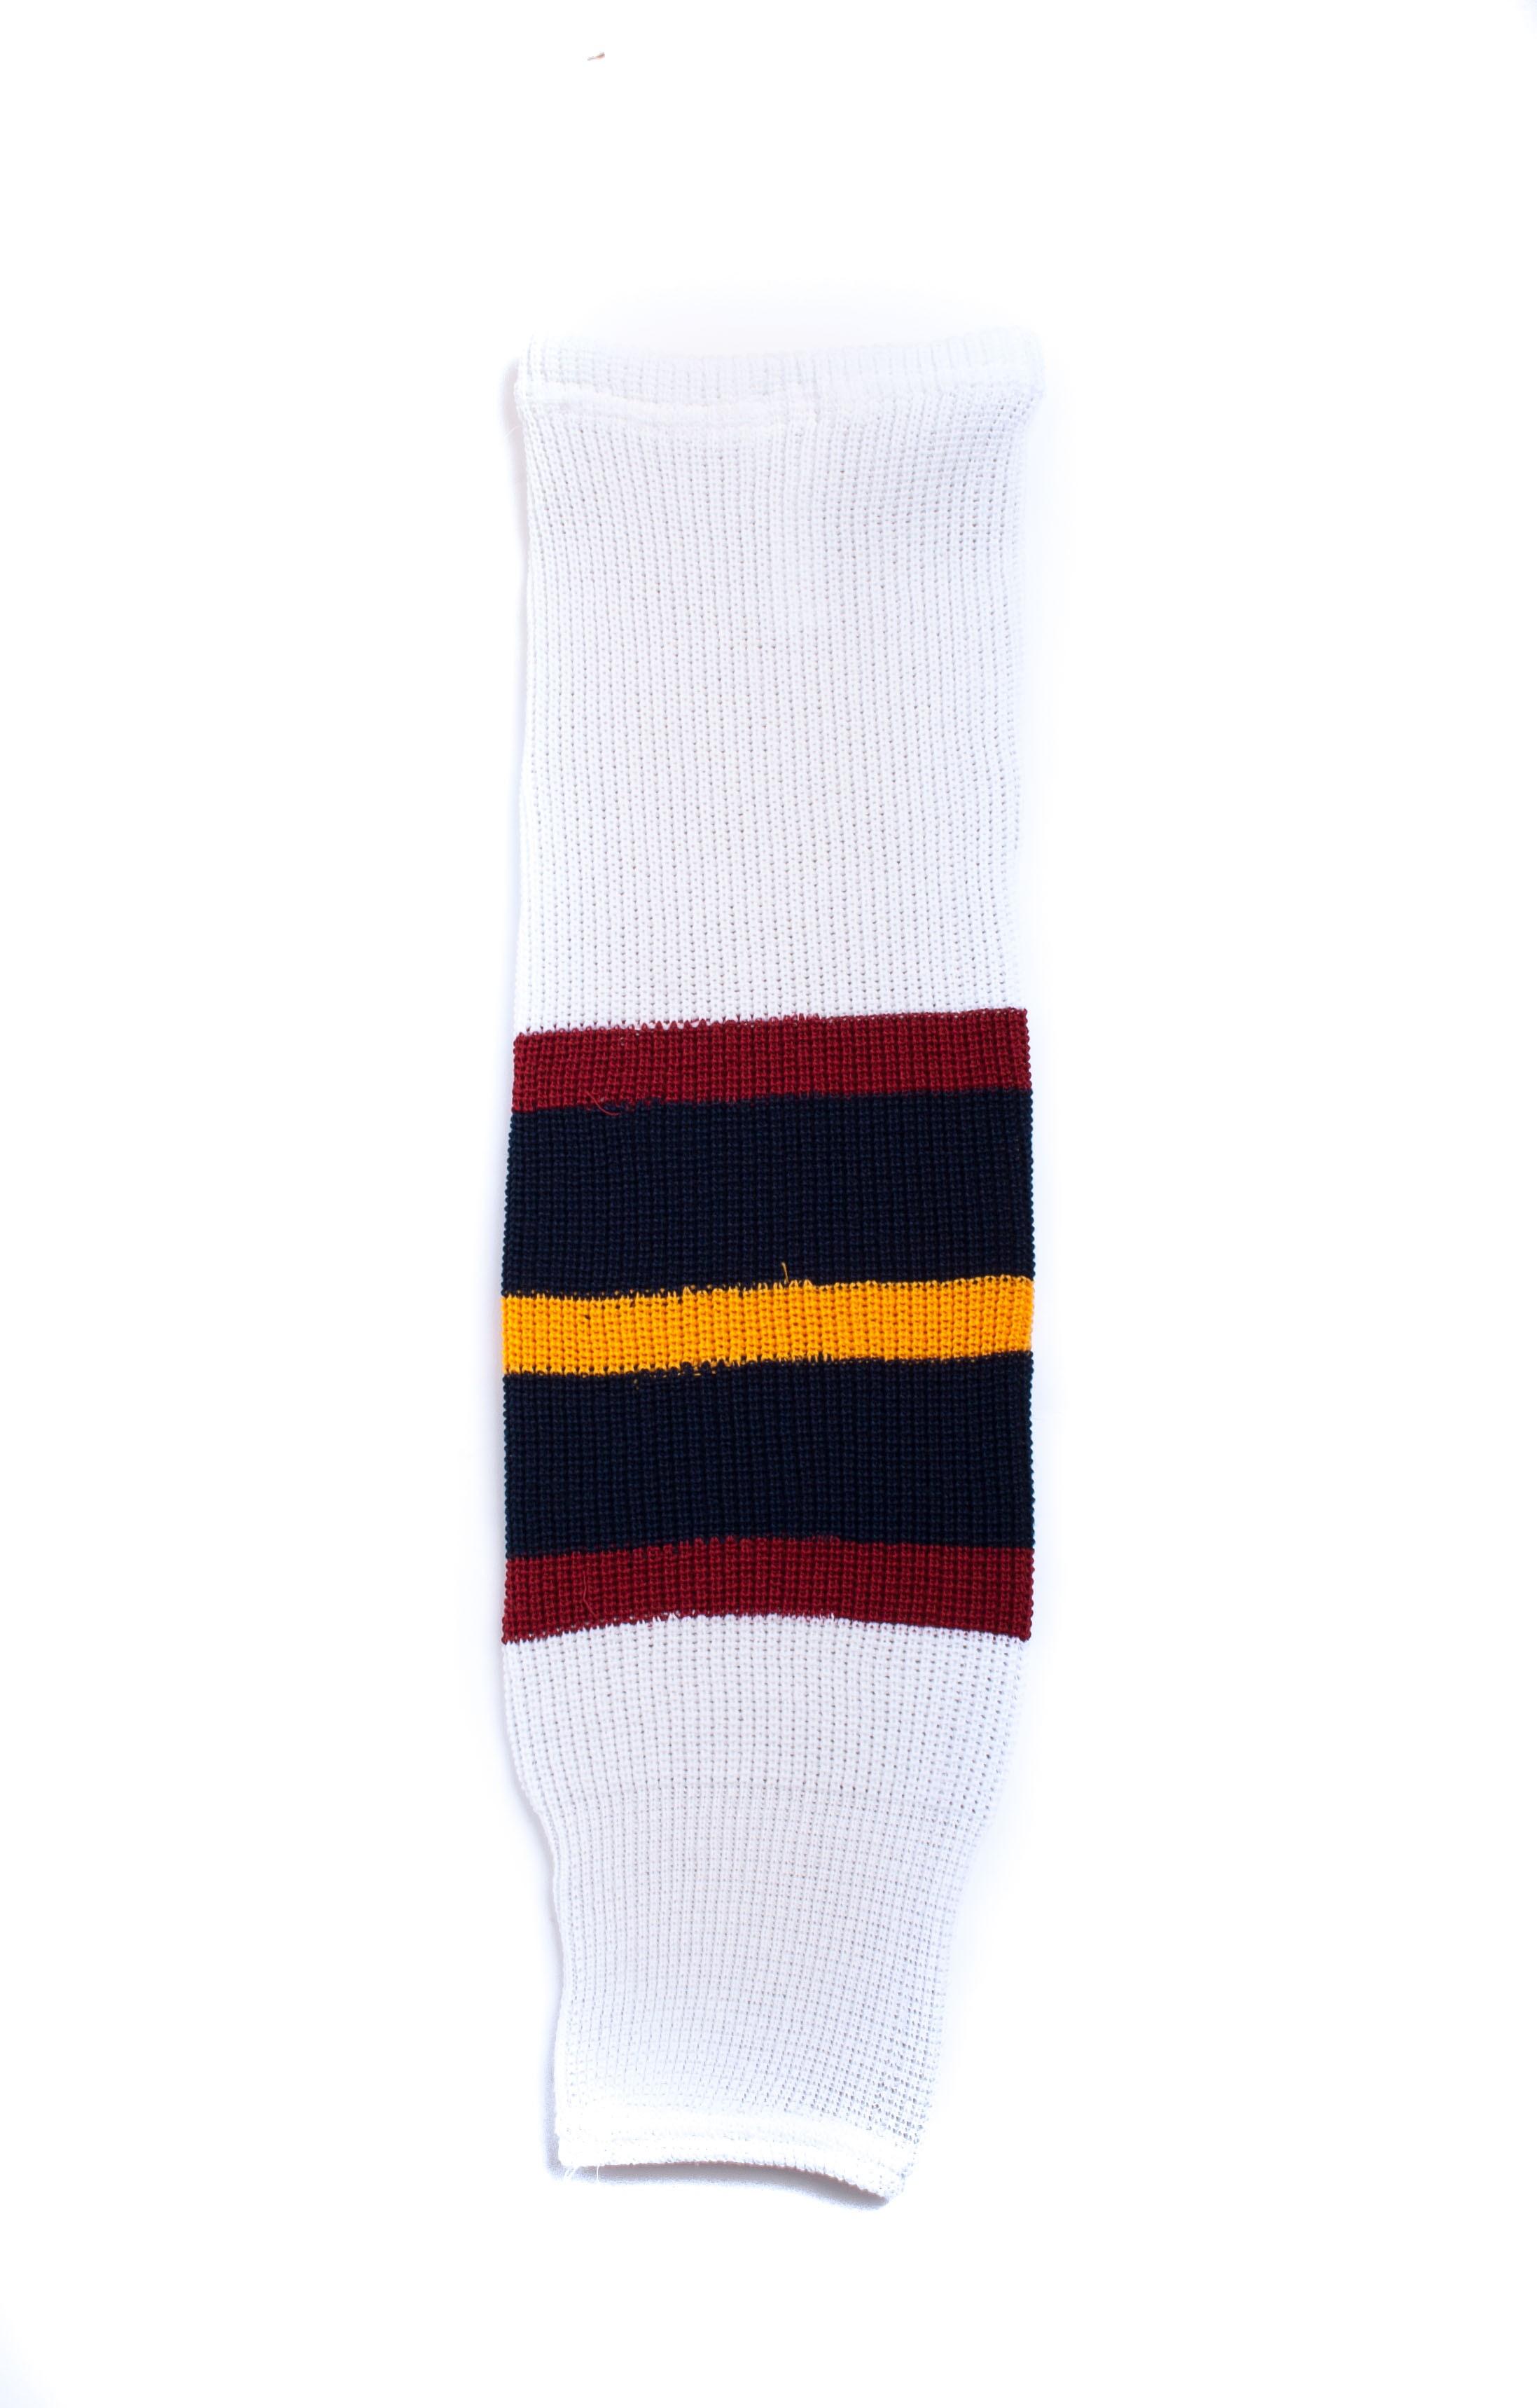 CCM Knit Ault Hokeja Getras #019